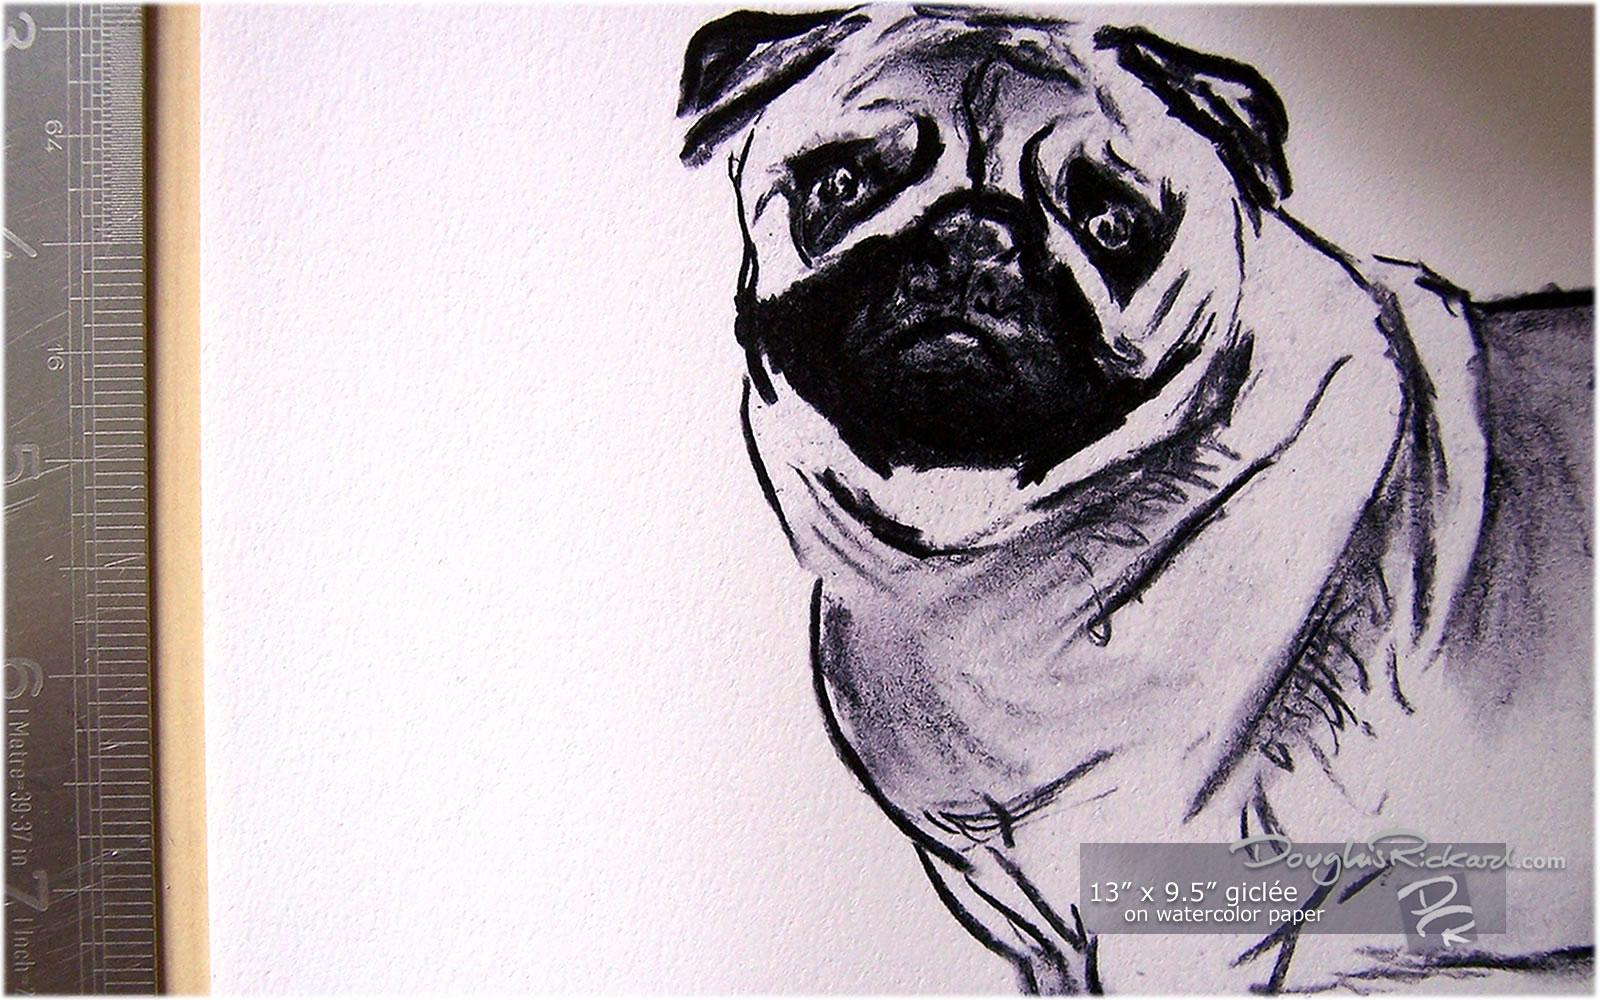 Drawn pug watercolor 5